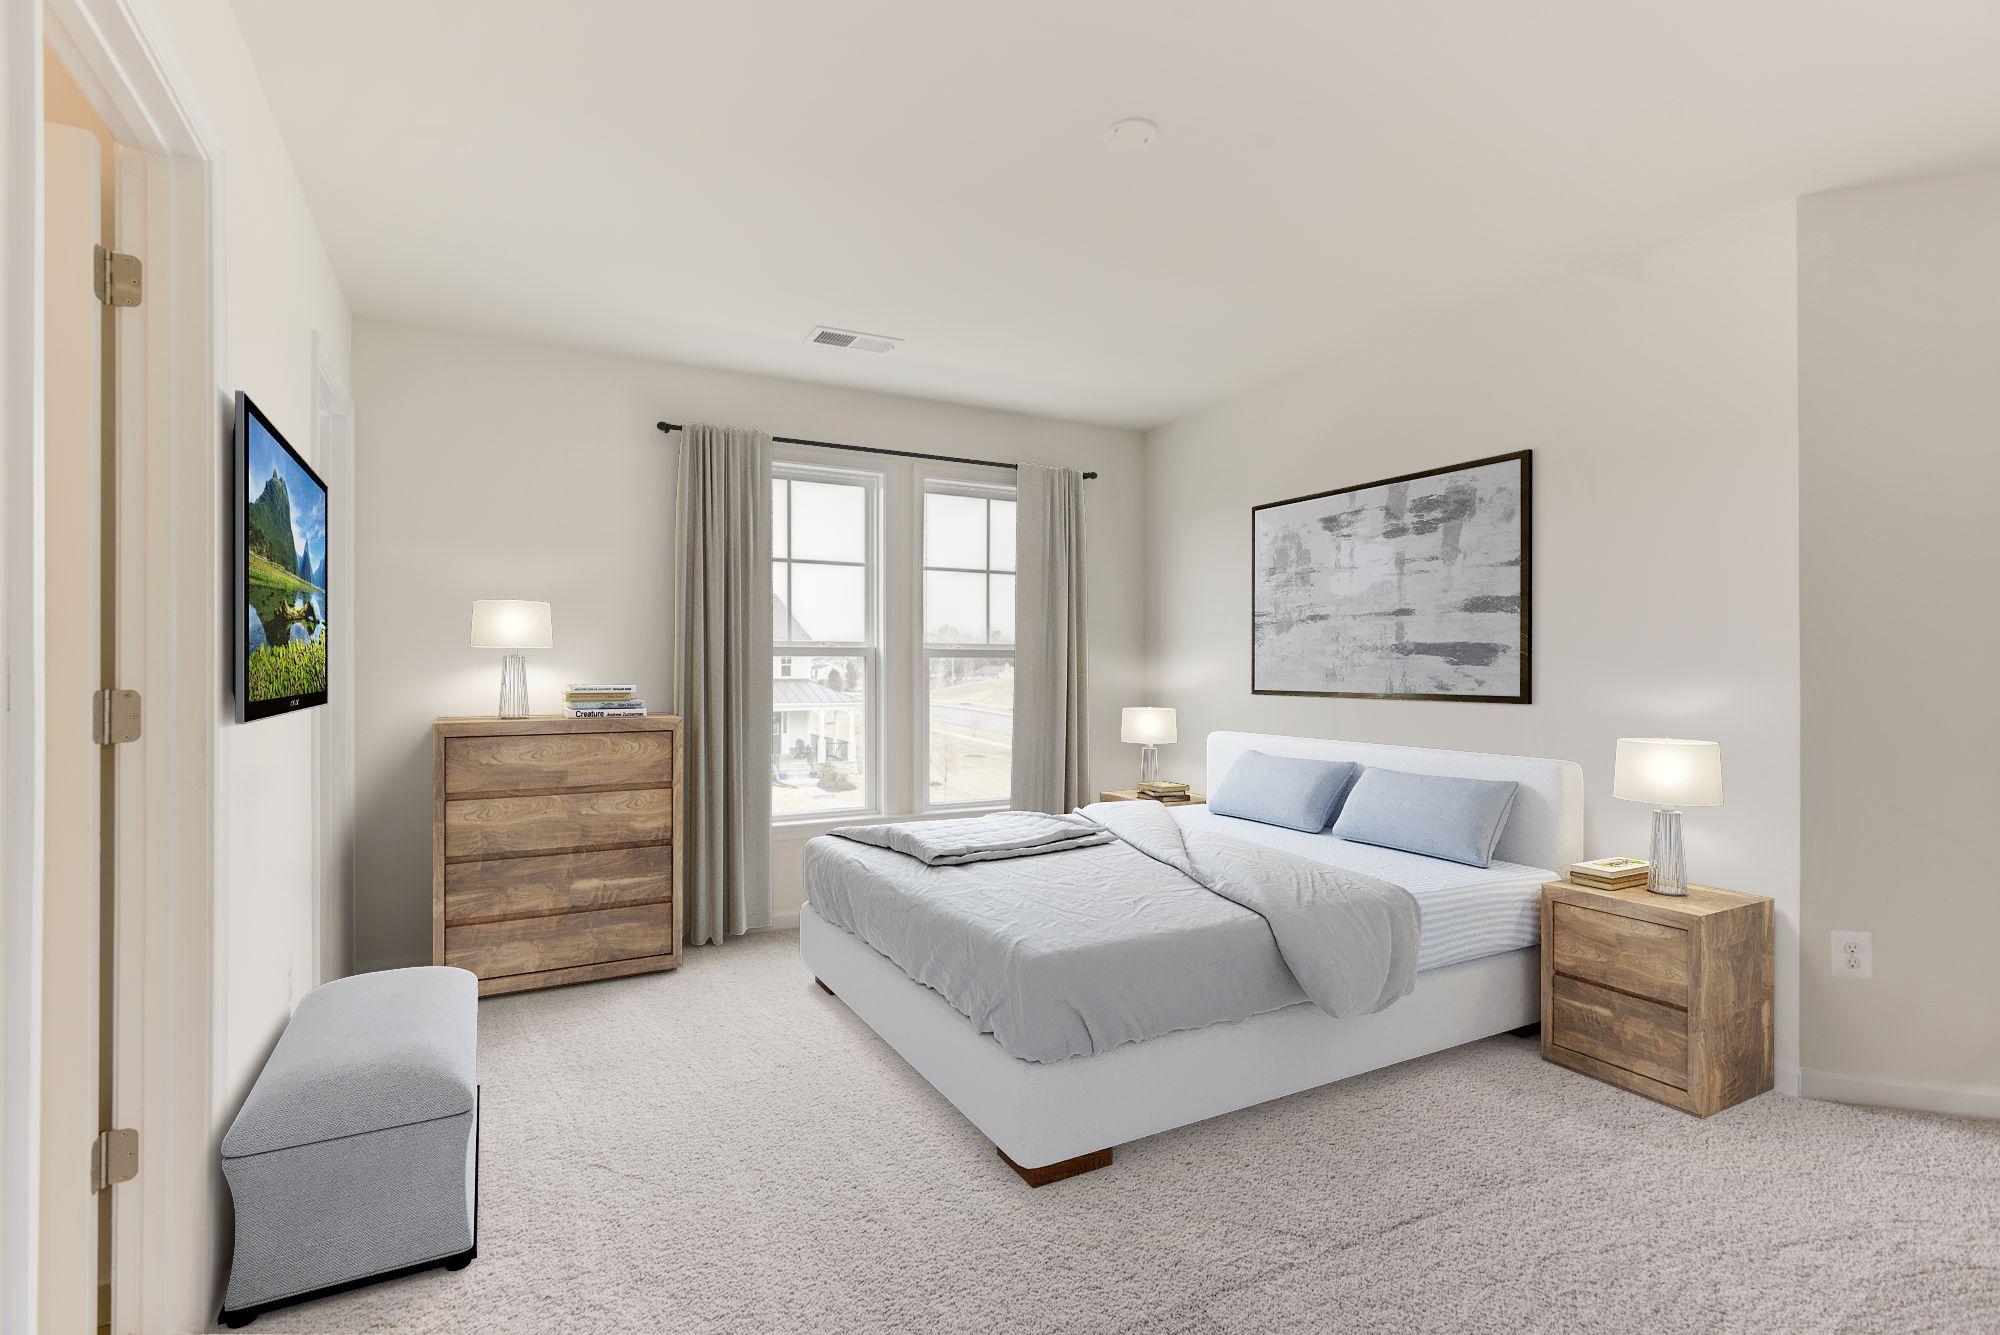 Bedroom featured in the Stratford By Van Metre Homes in Washington, VA